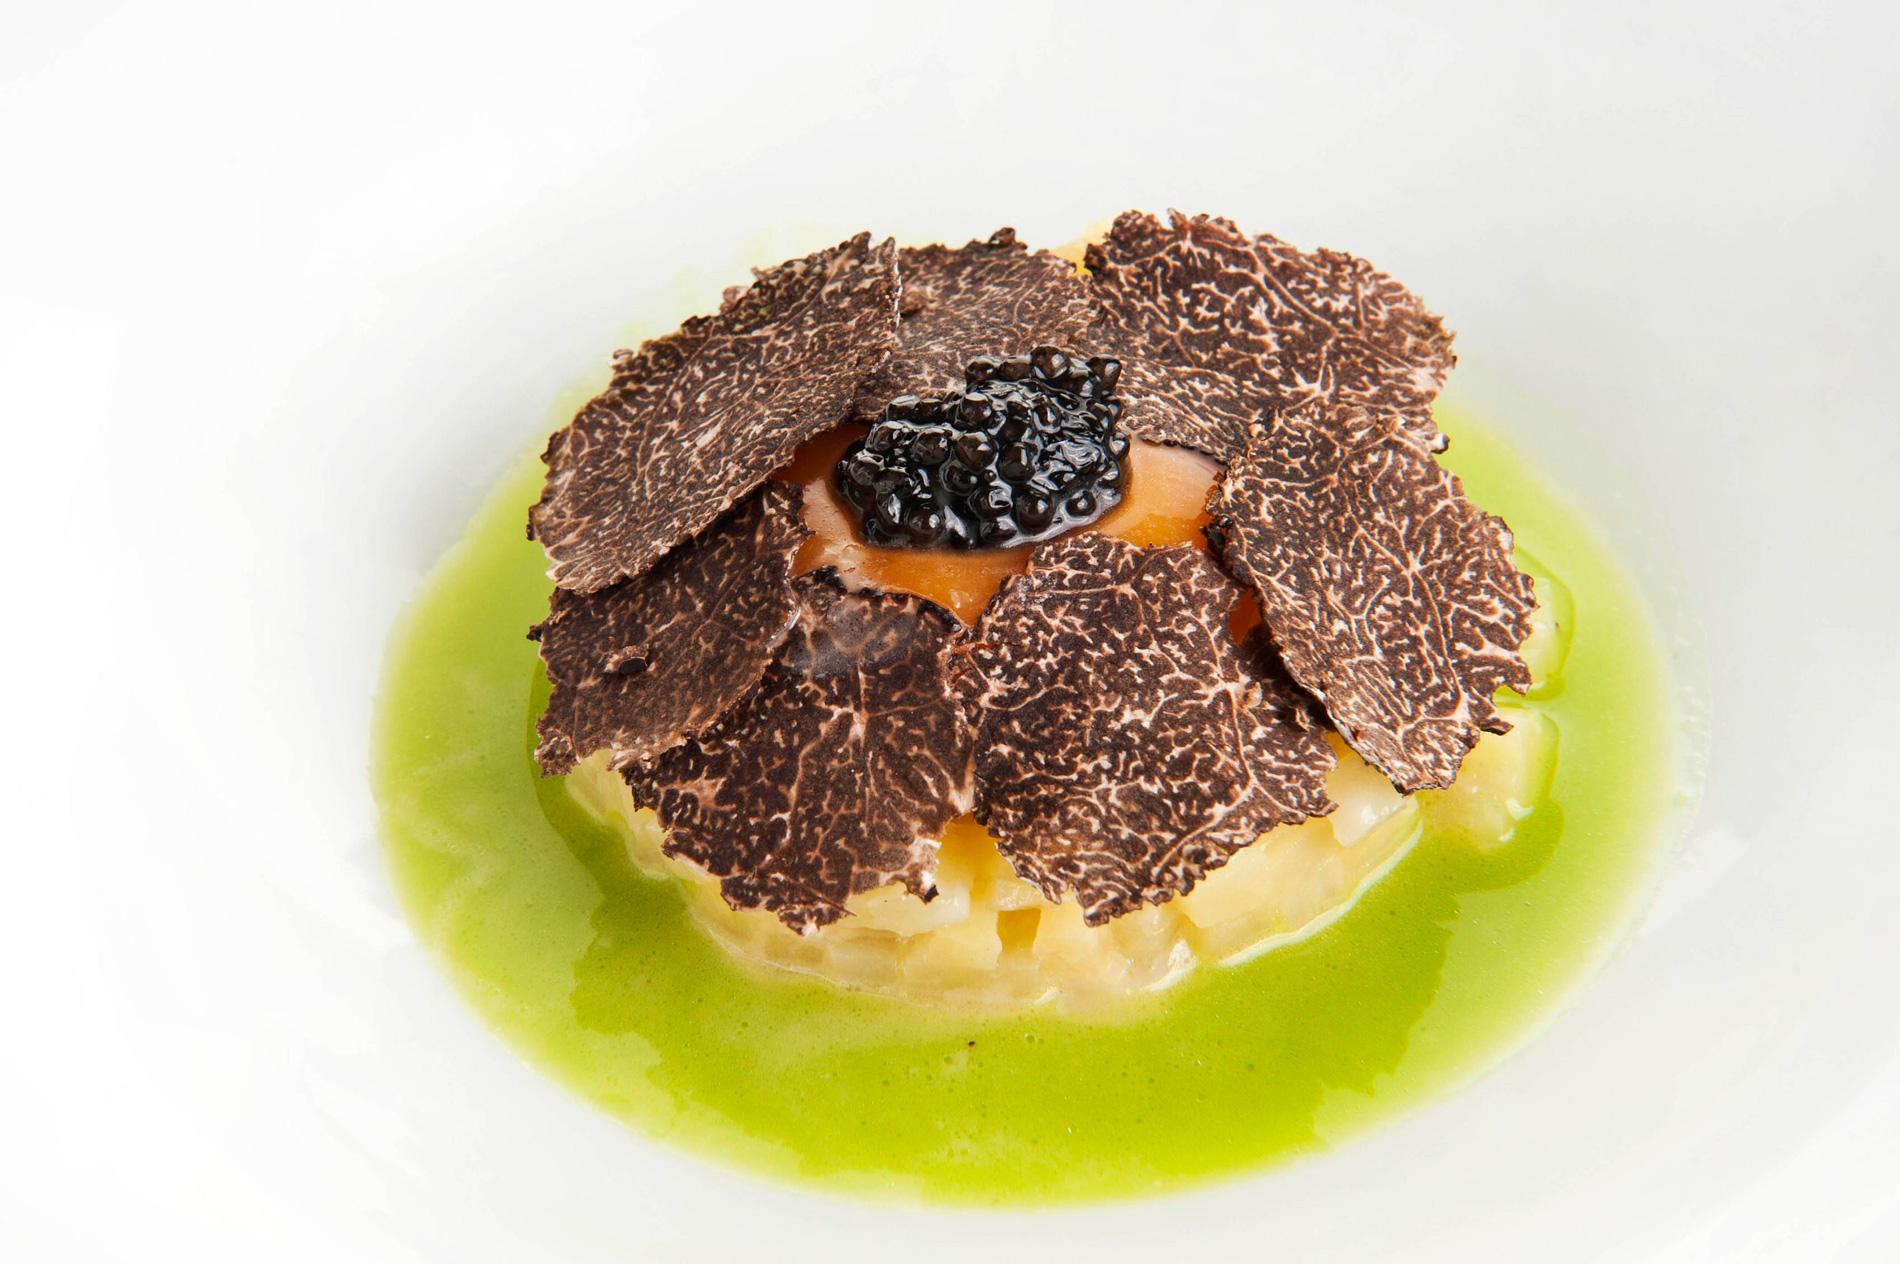 Agenda gastronómica de Madrid (del 22 al 28 Febrero)